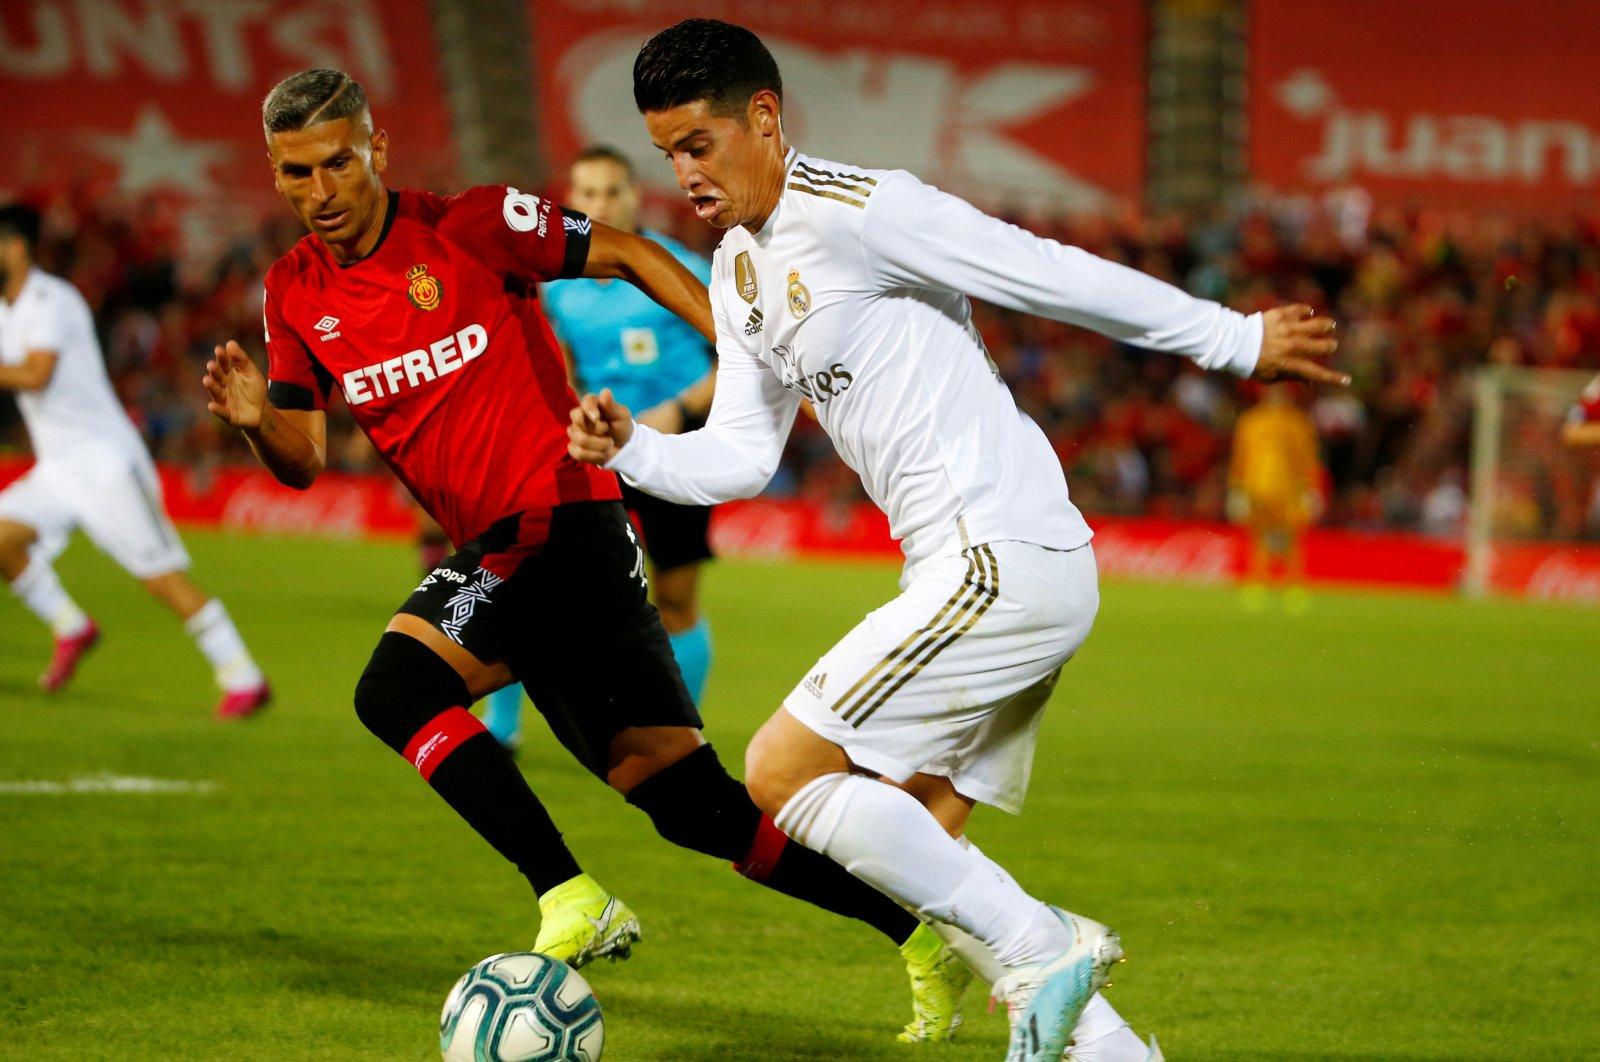 Real Madrid's James Rodriguez (R) dribbles the ball past Mallorca's Salva Sevilla at Iberostar Stadium, Palma, Spain, Oct. 19, 2019. (Reuters Photo)